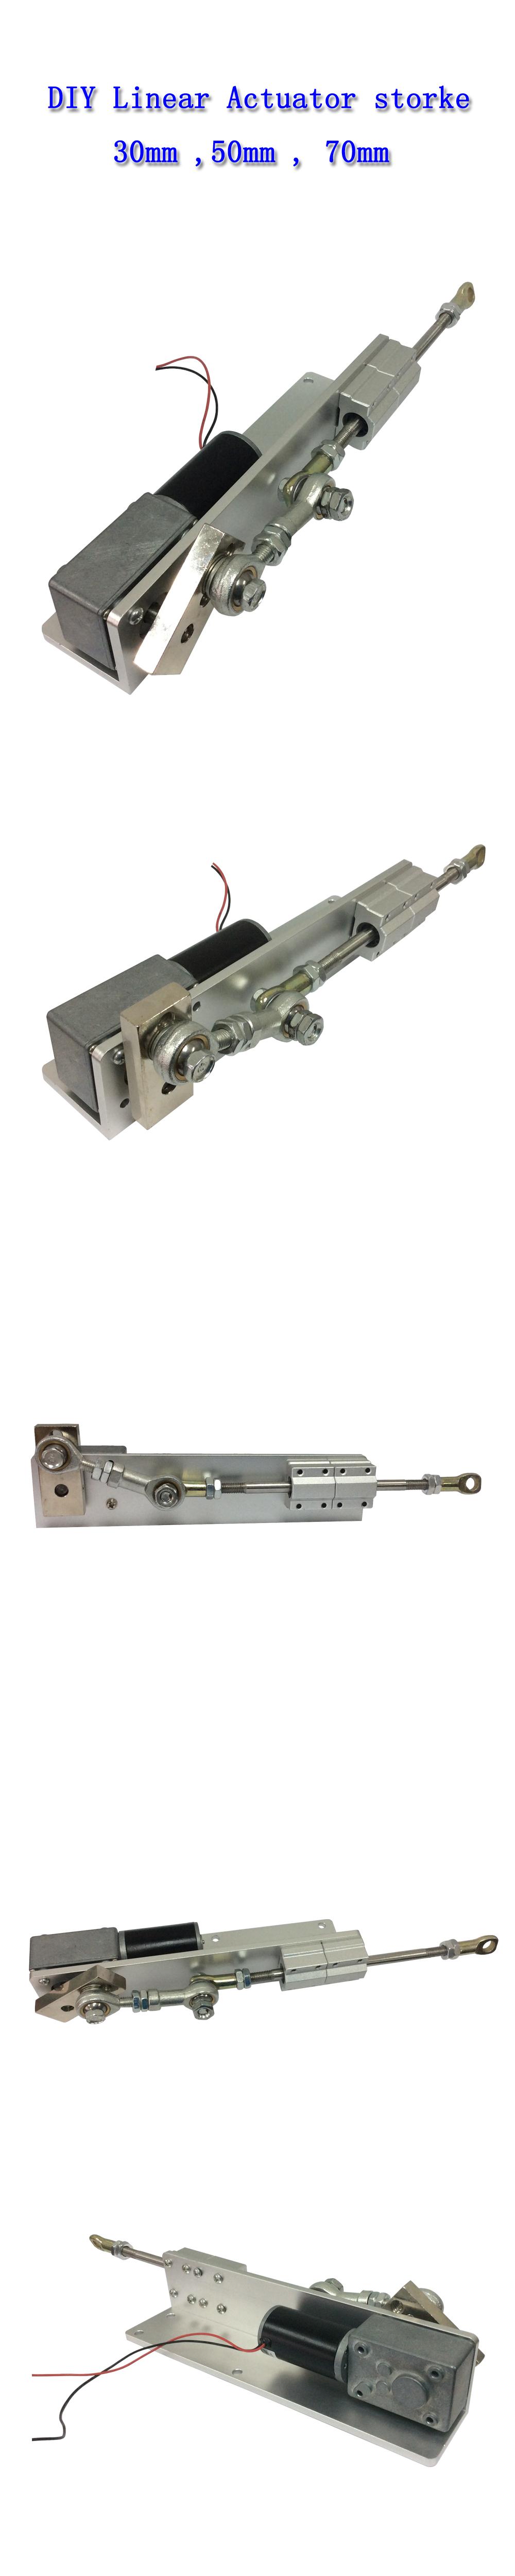 dc12v 70mm 1kg linear actuator reciprocating motor for diy design dc12v 70mm 1kg linear actuator reciprocating motor for diy design there are several no